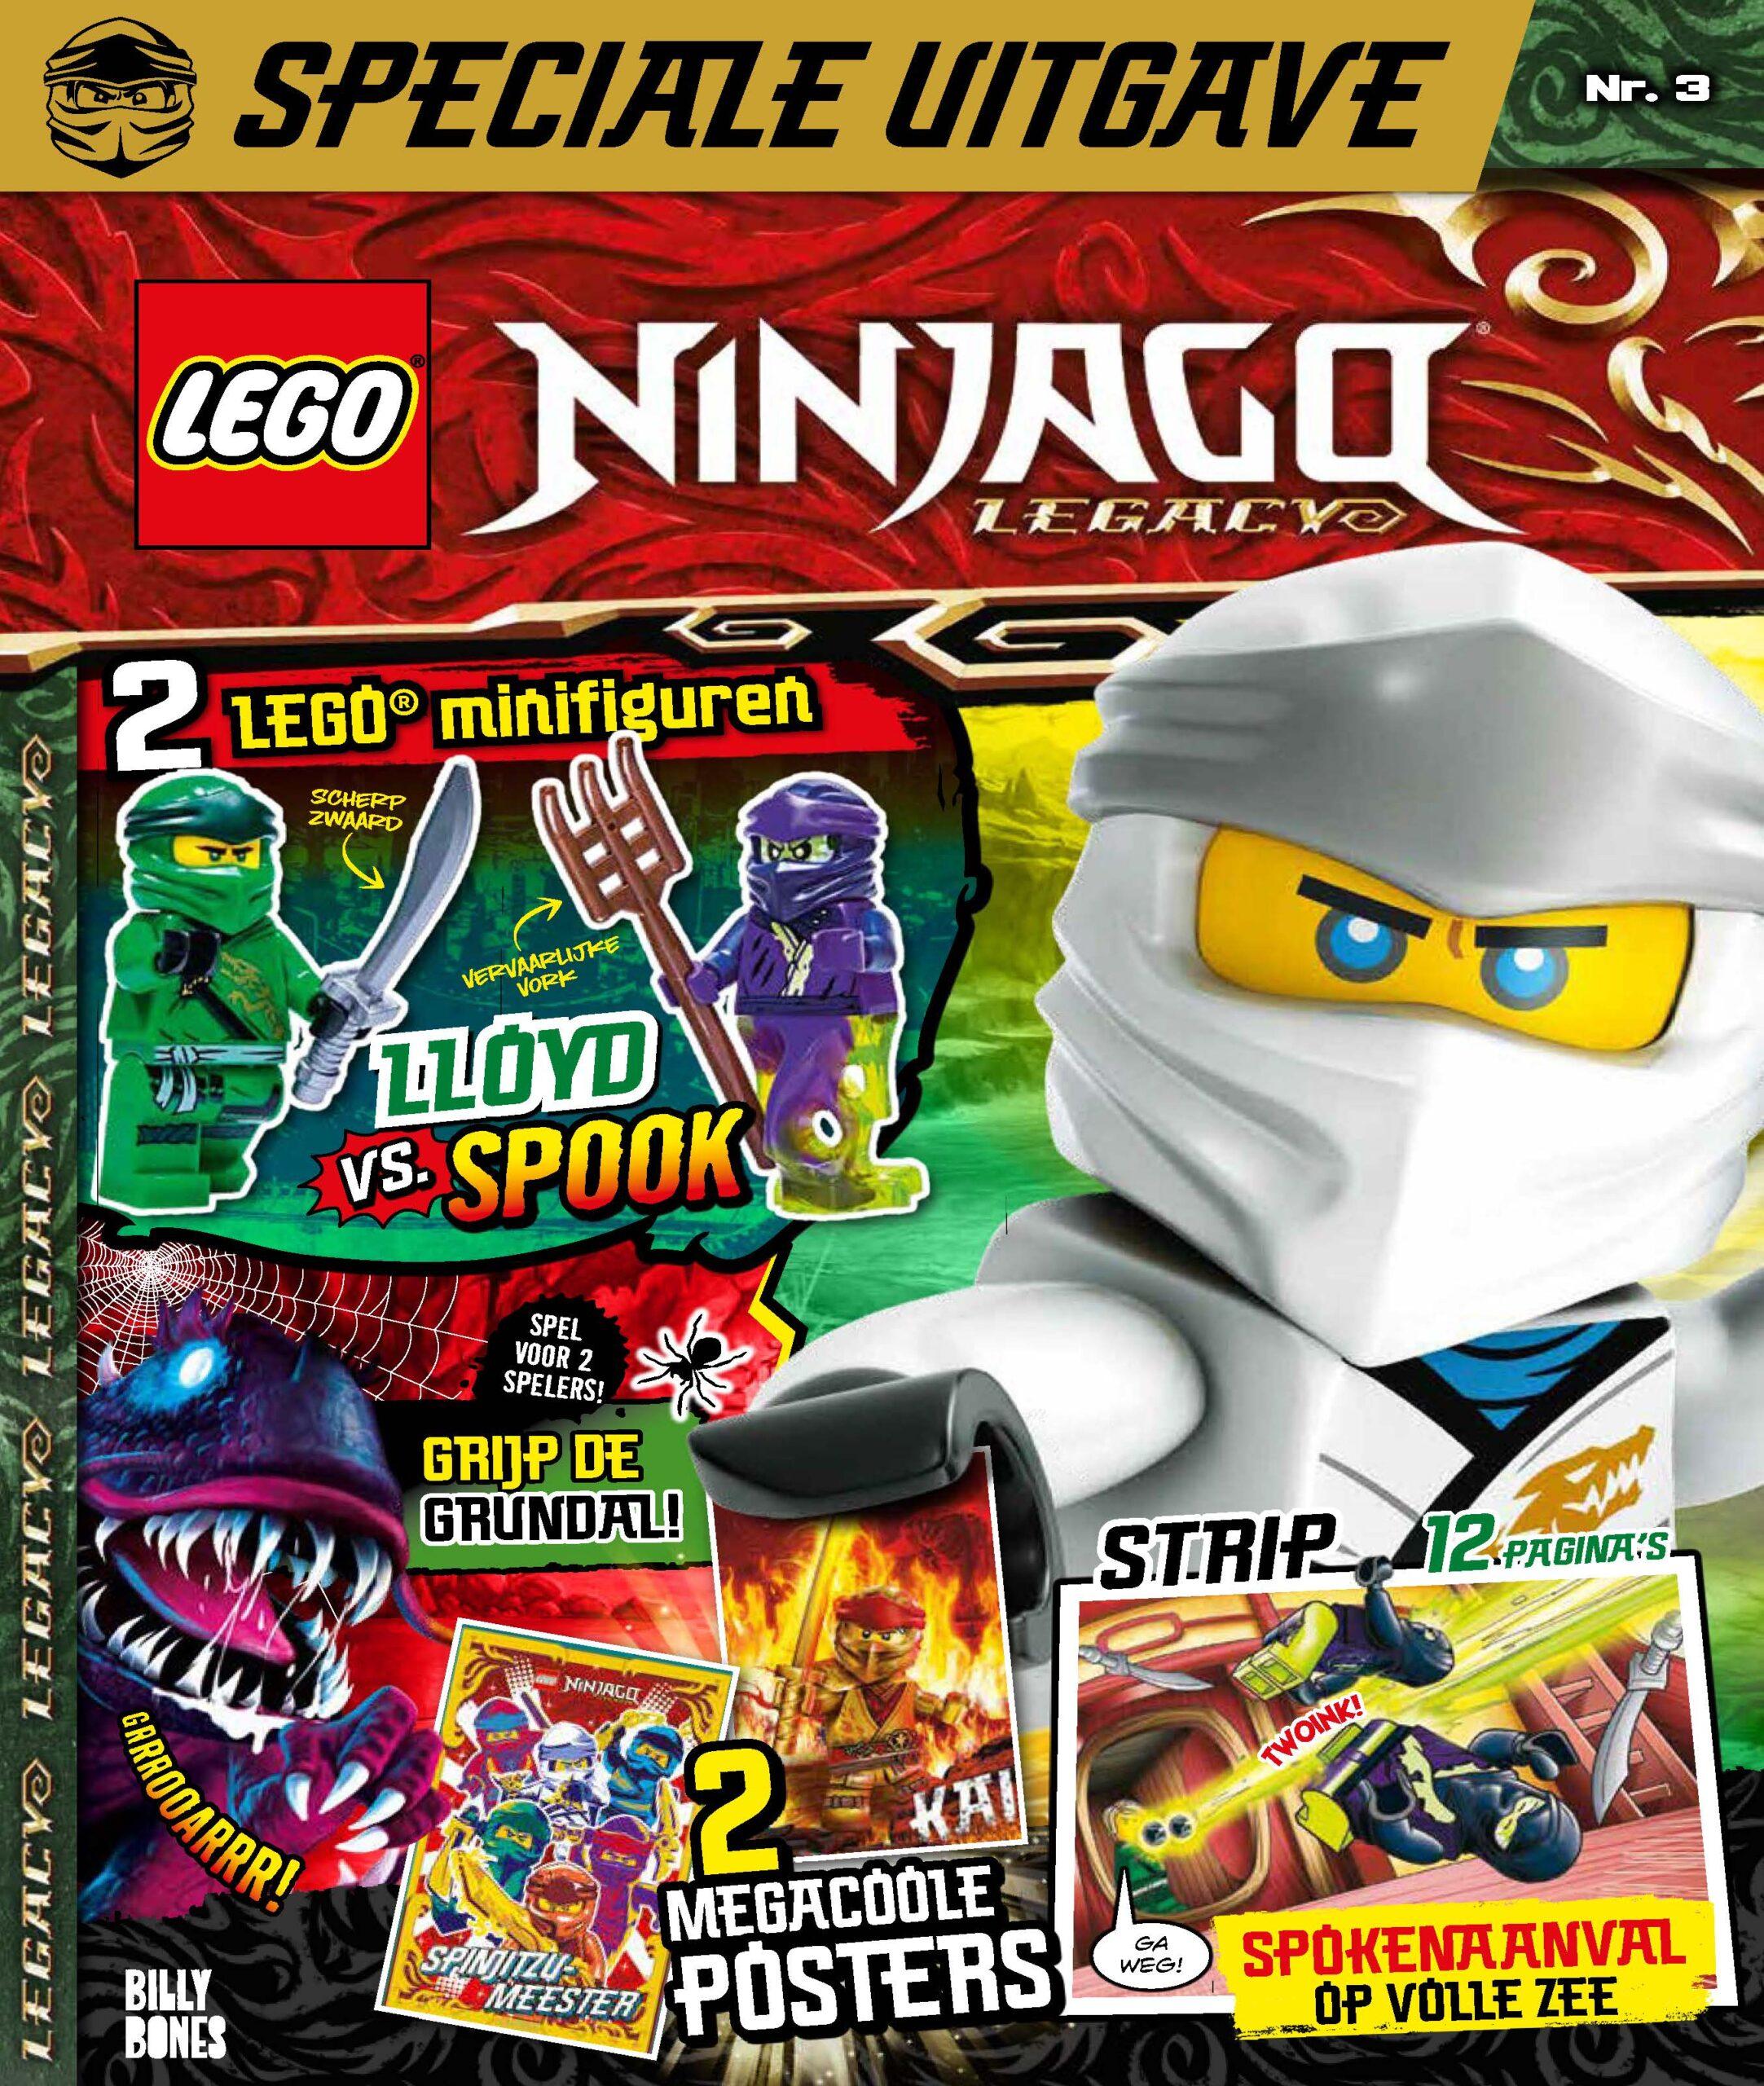 LEGO Ninjago Legacy magazine 03 2021